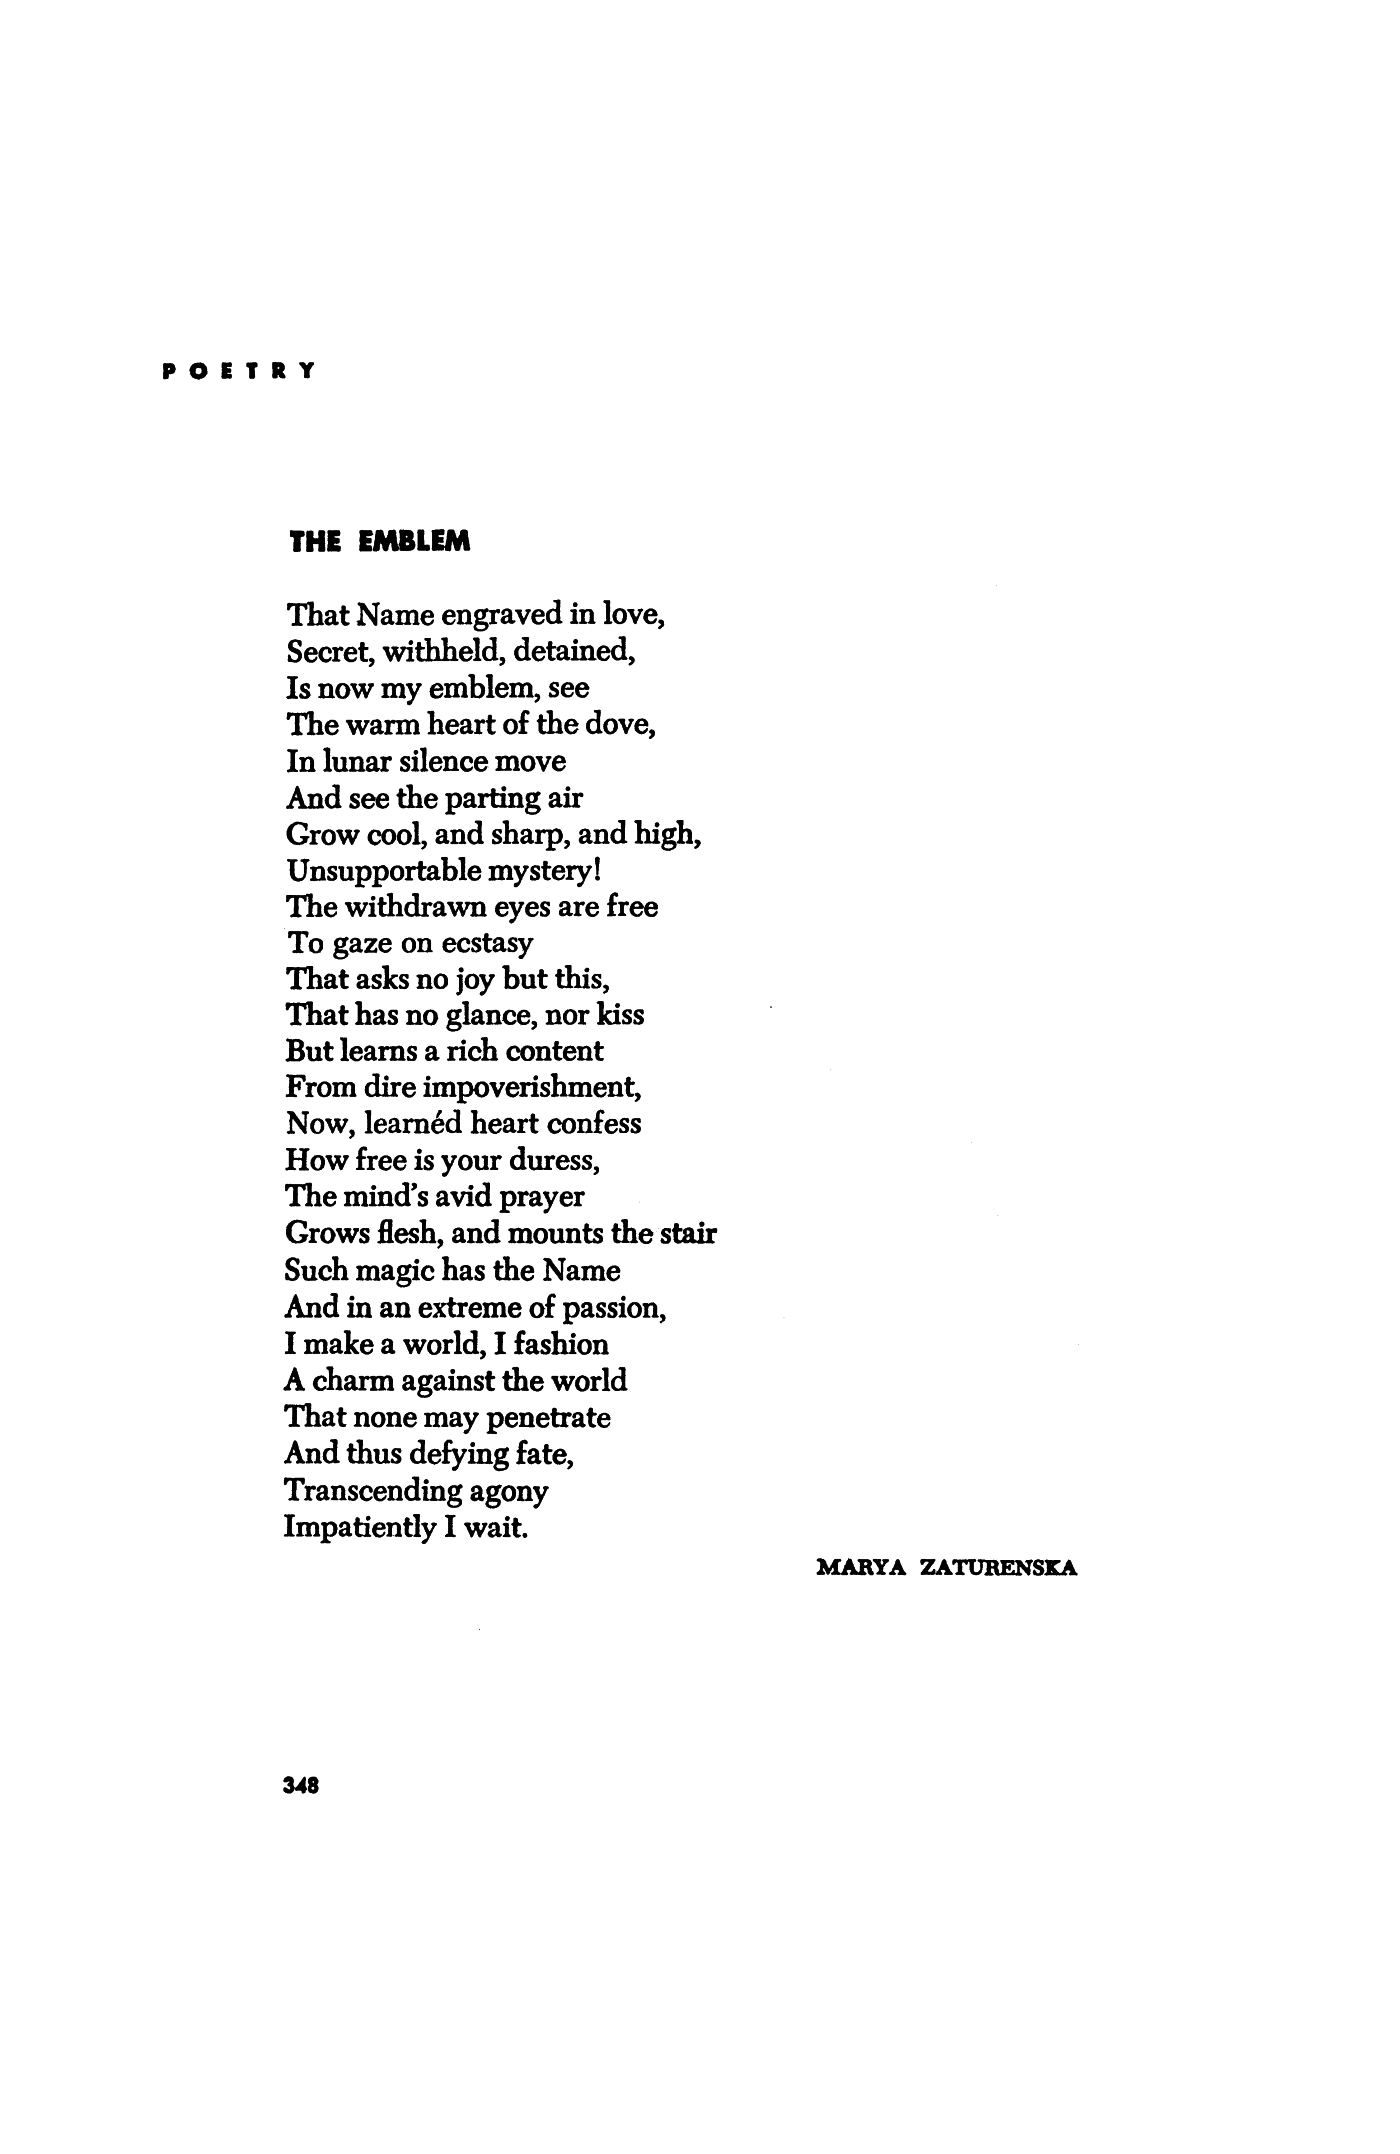 Marya Zaturenska horace gregory